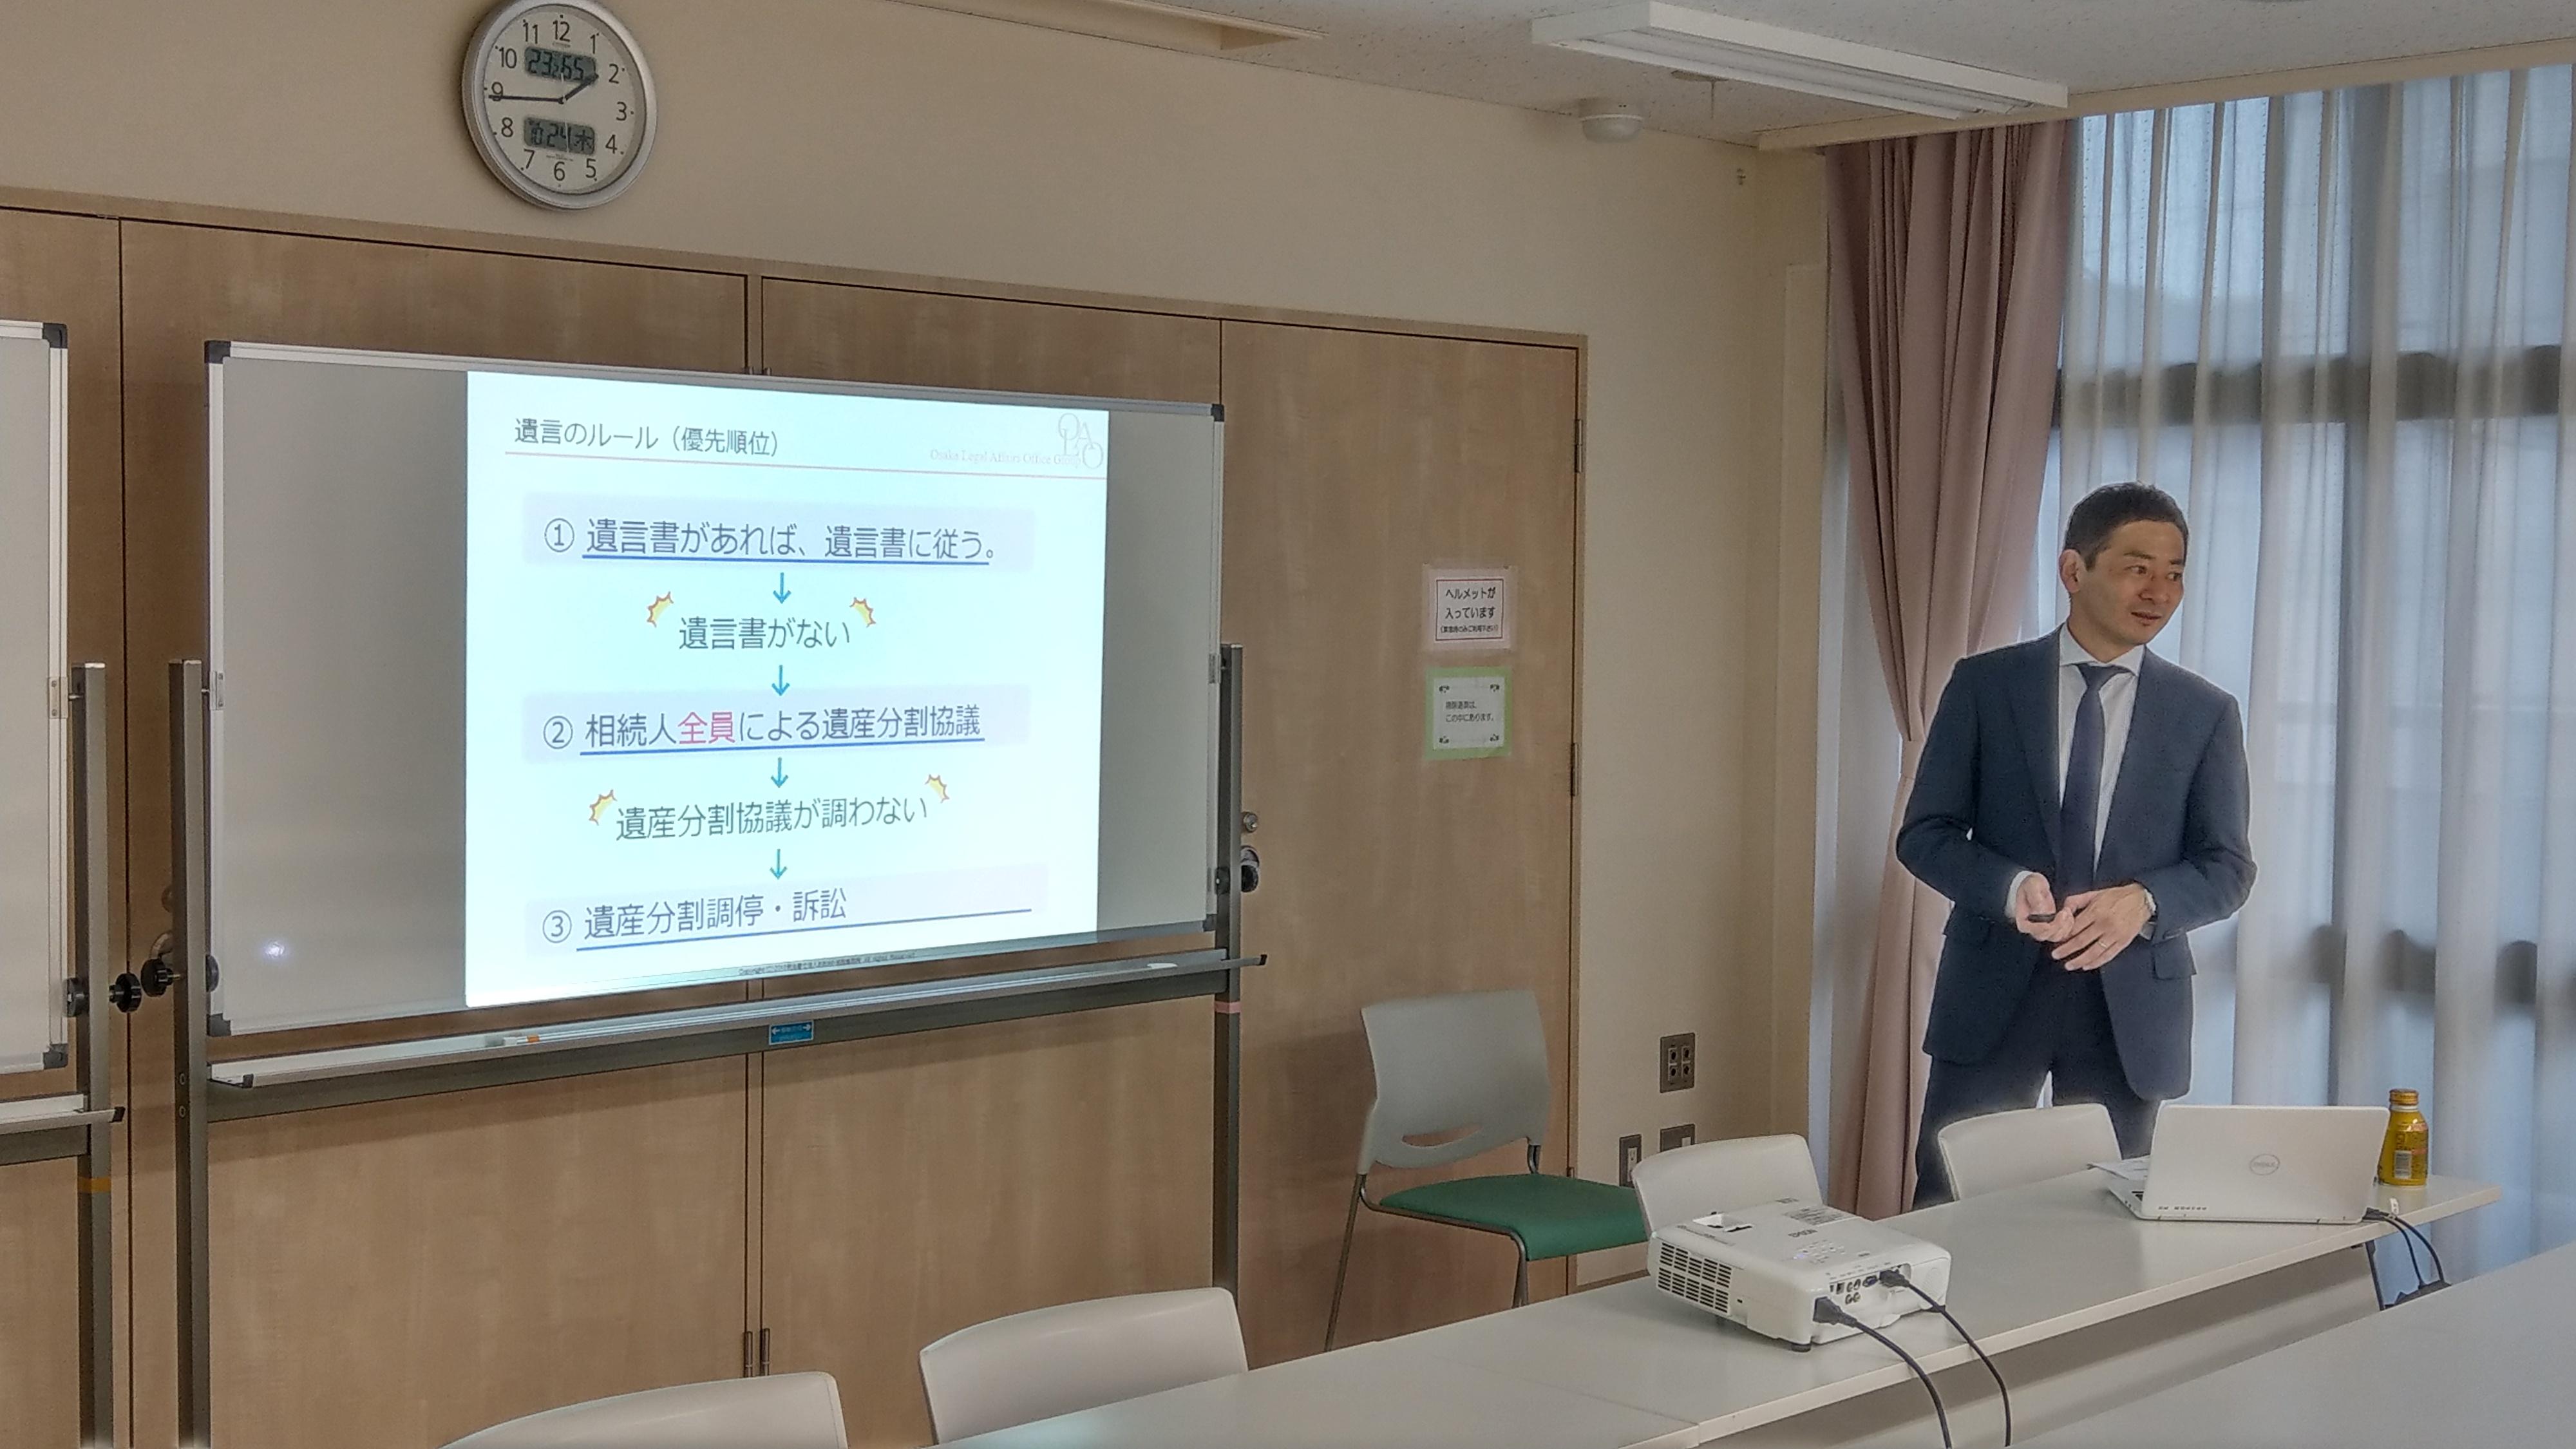 【10/24】(一社)相続総合相談センター様主催・相続総合対策セミナー